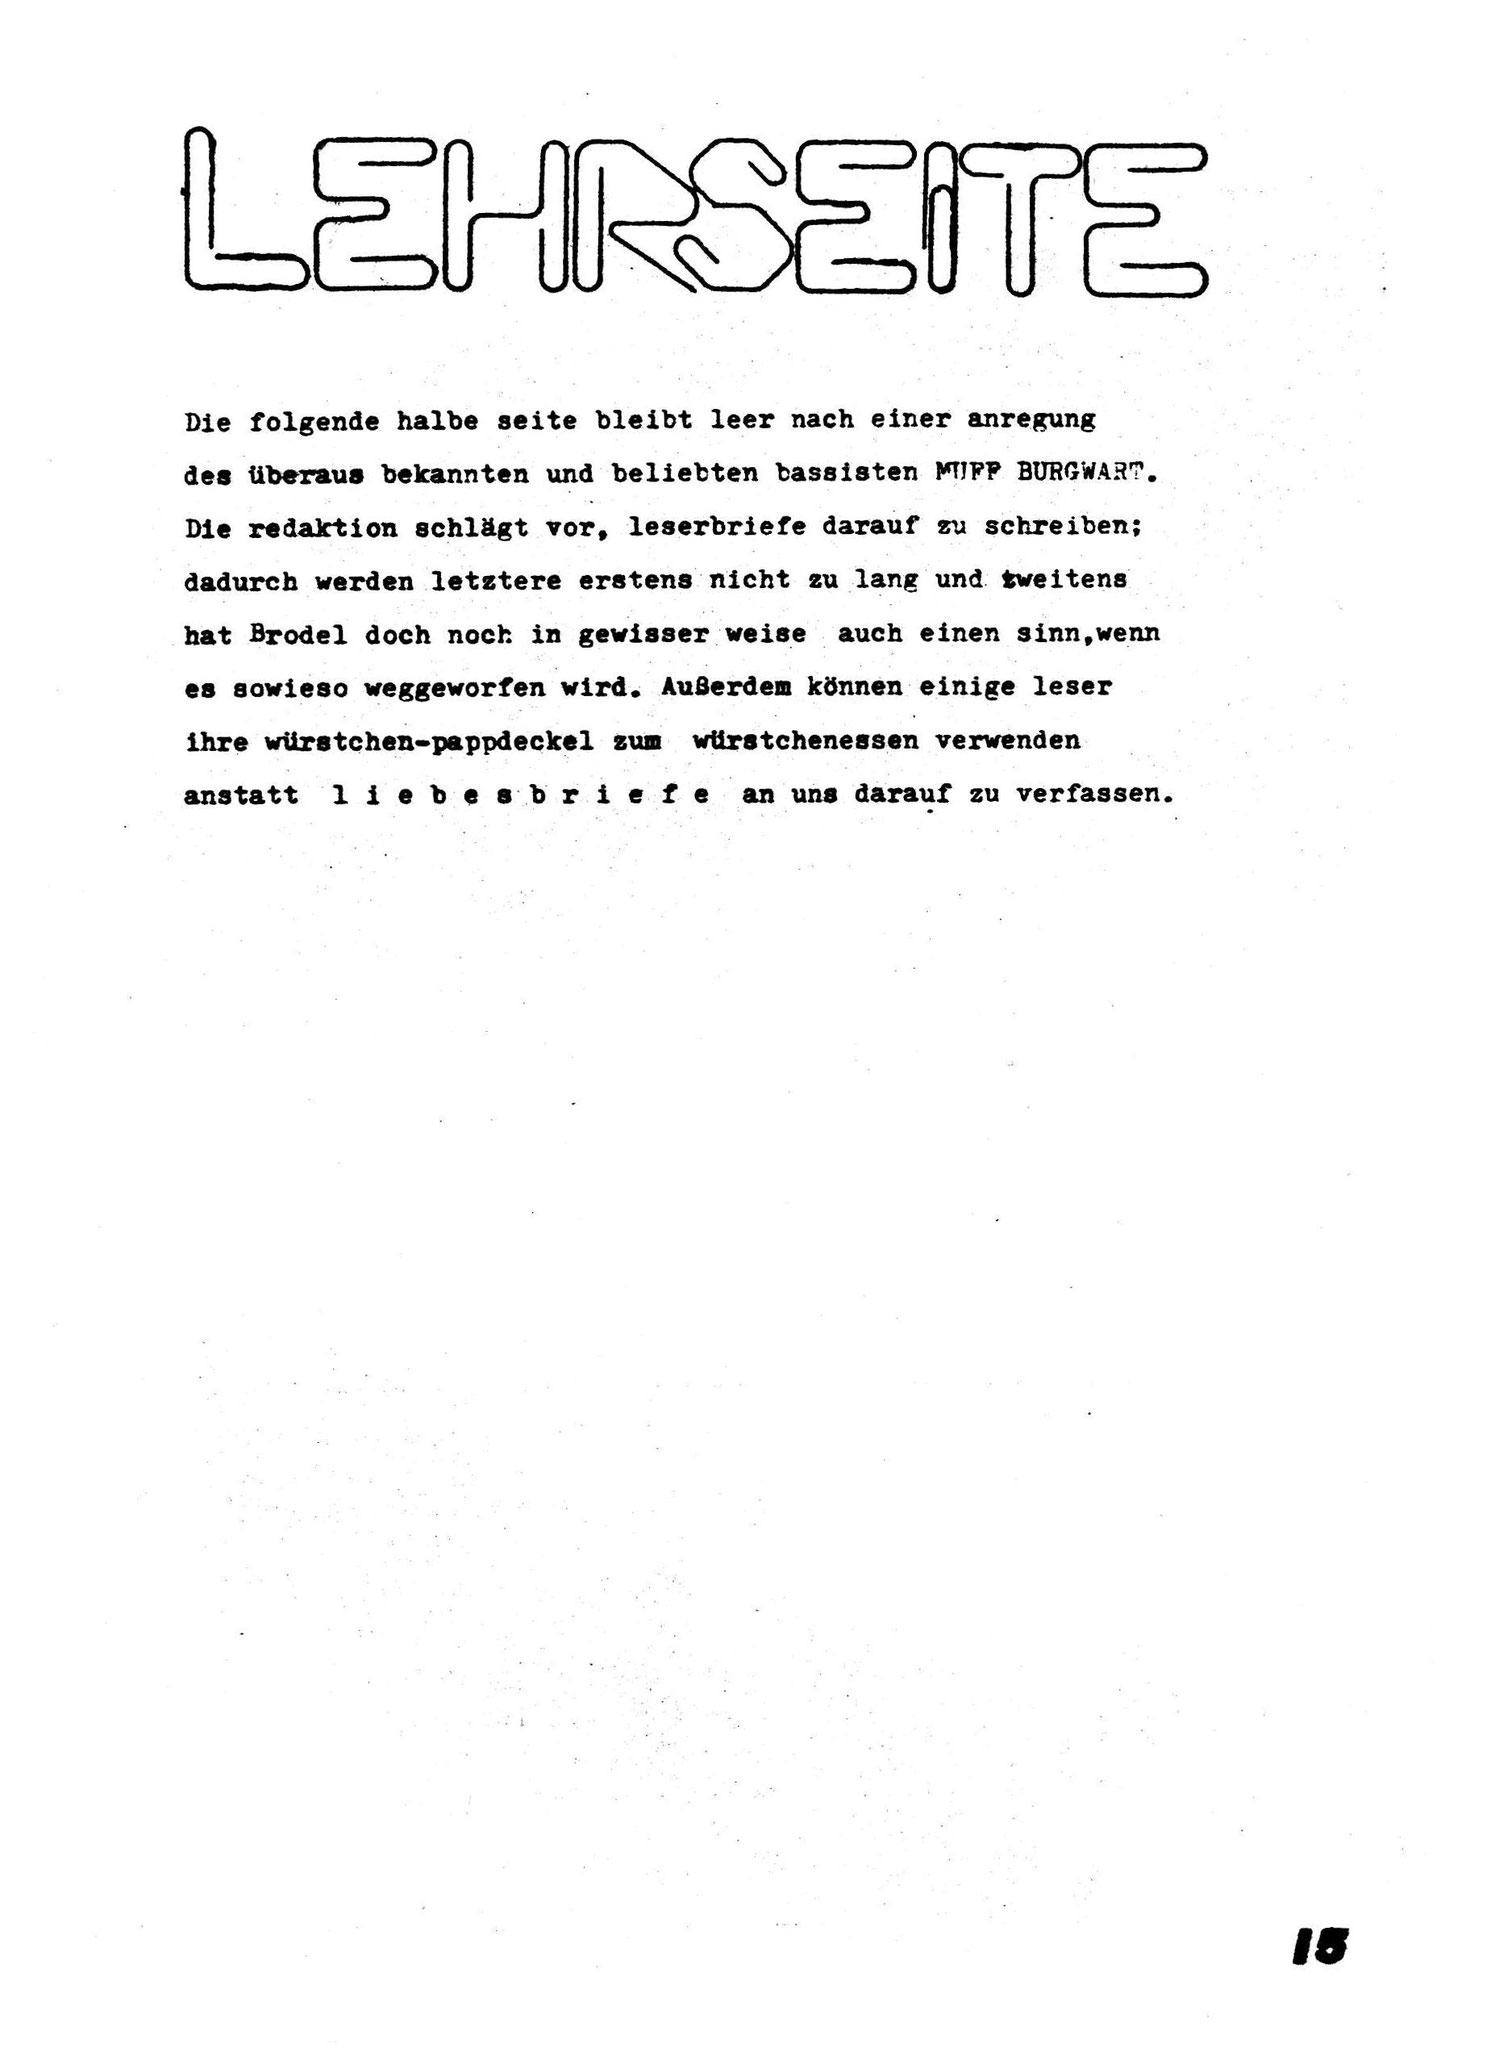 Brodel 7 - Seite 16